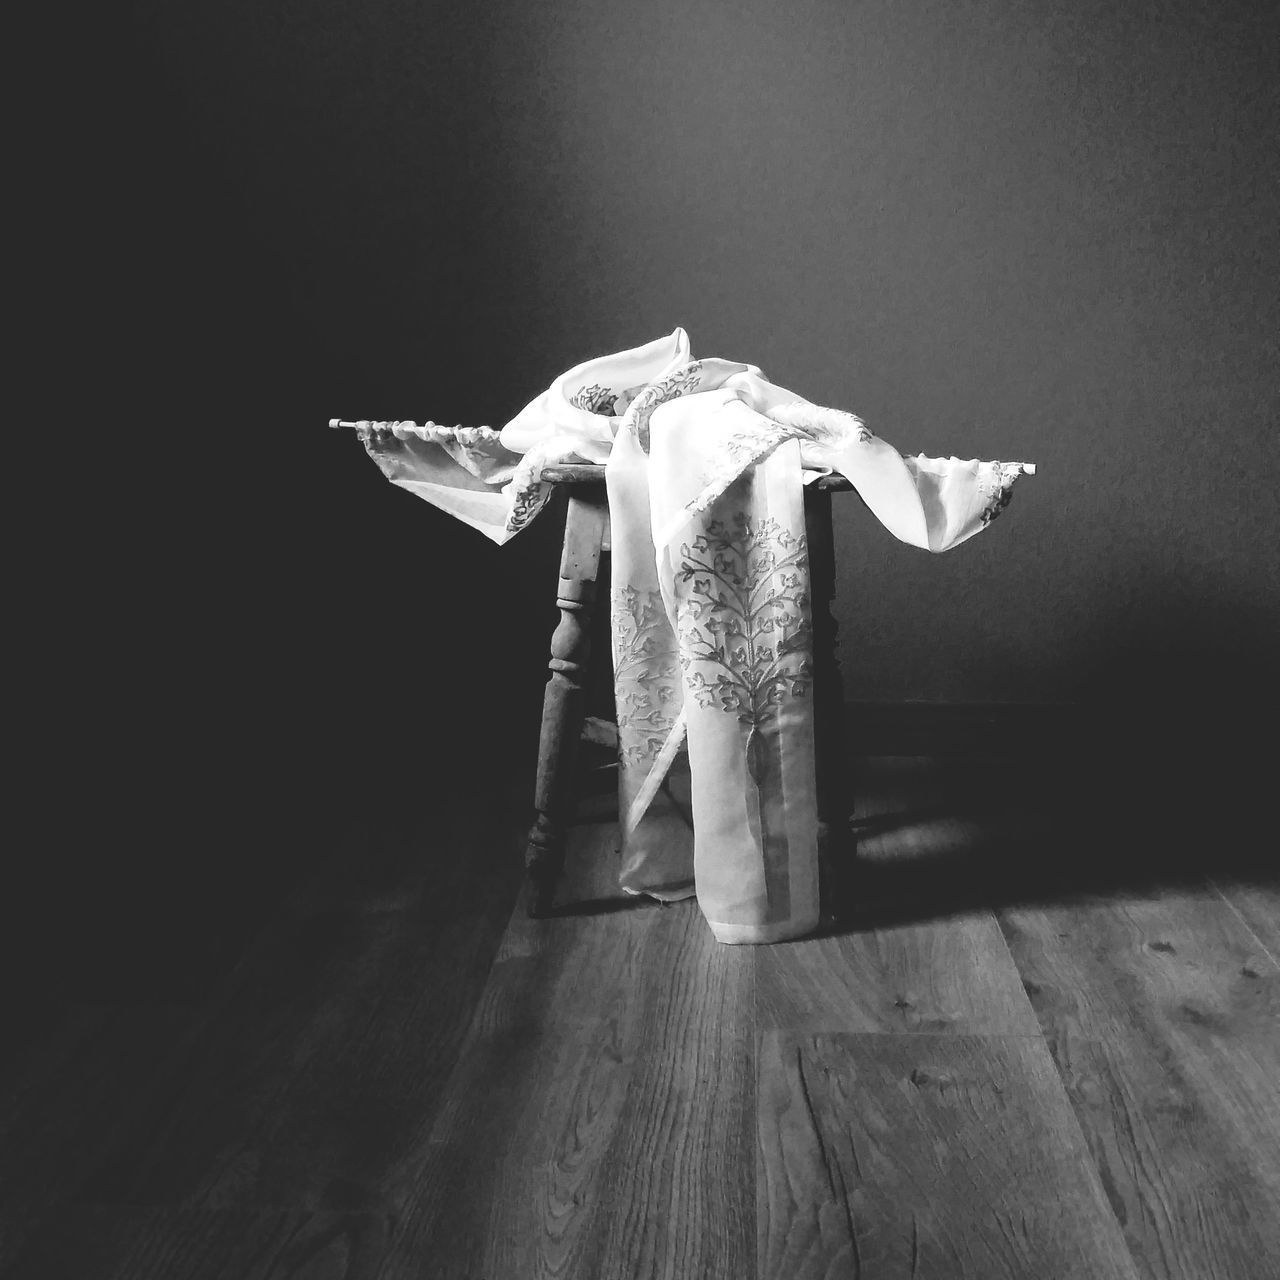 indoors, no people, representation, still life, flooring, wood, hardwood floor, wood - material, wall - building feature, animal body part, human representation, art and craft, textile, mammal, creativity, close-up, hanging, body part